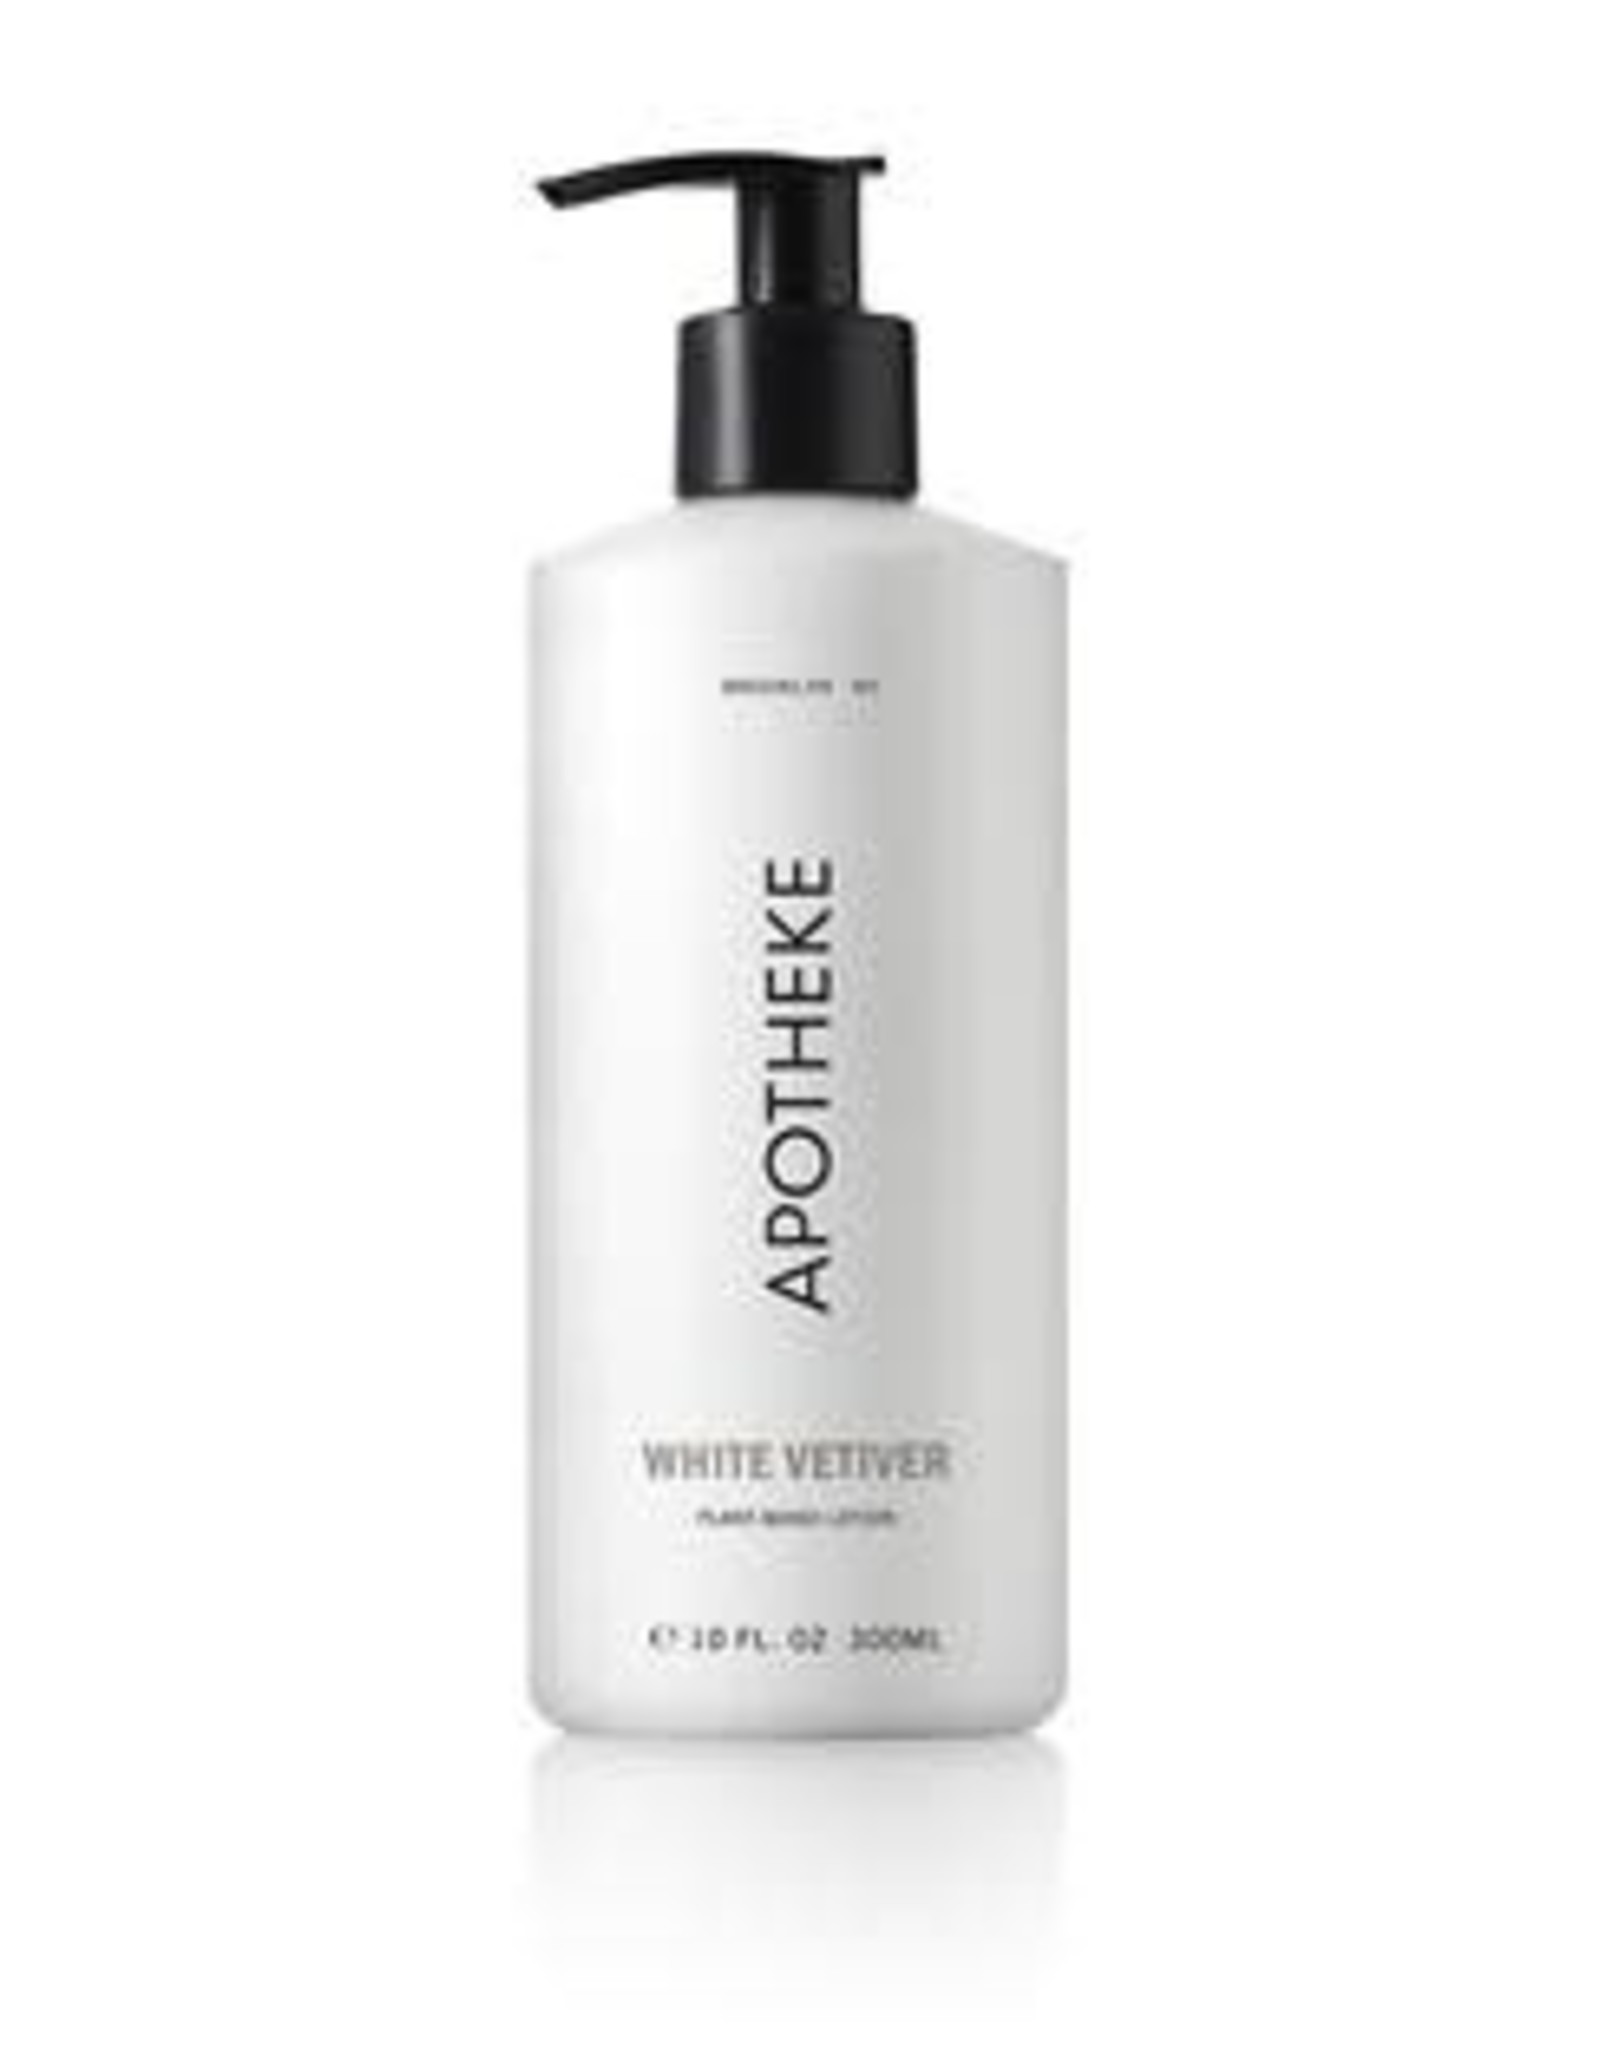 Apotheke Apotheke White Vetiver Lotion